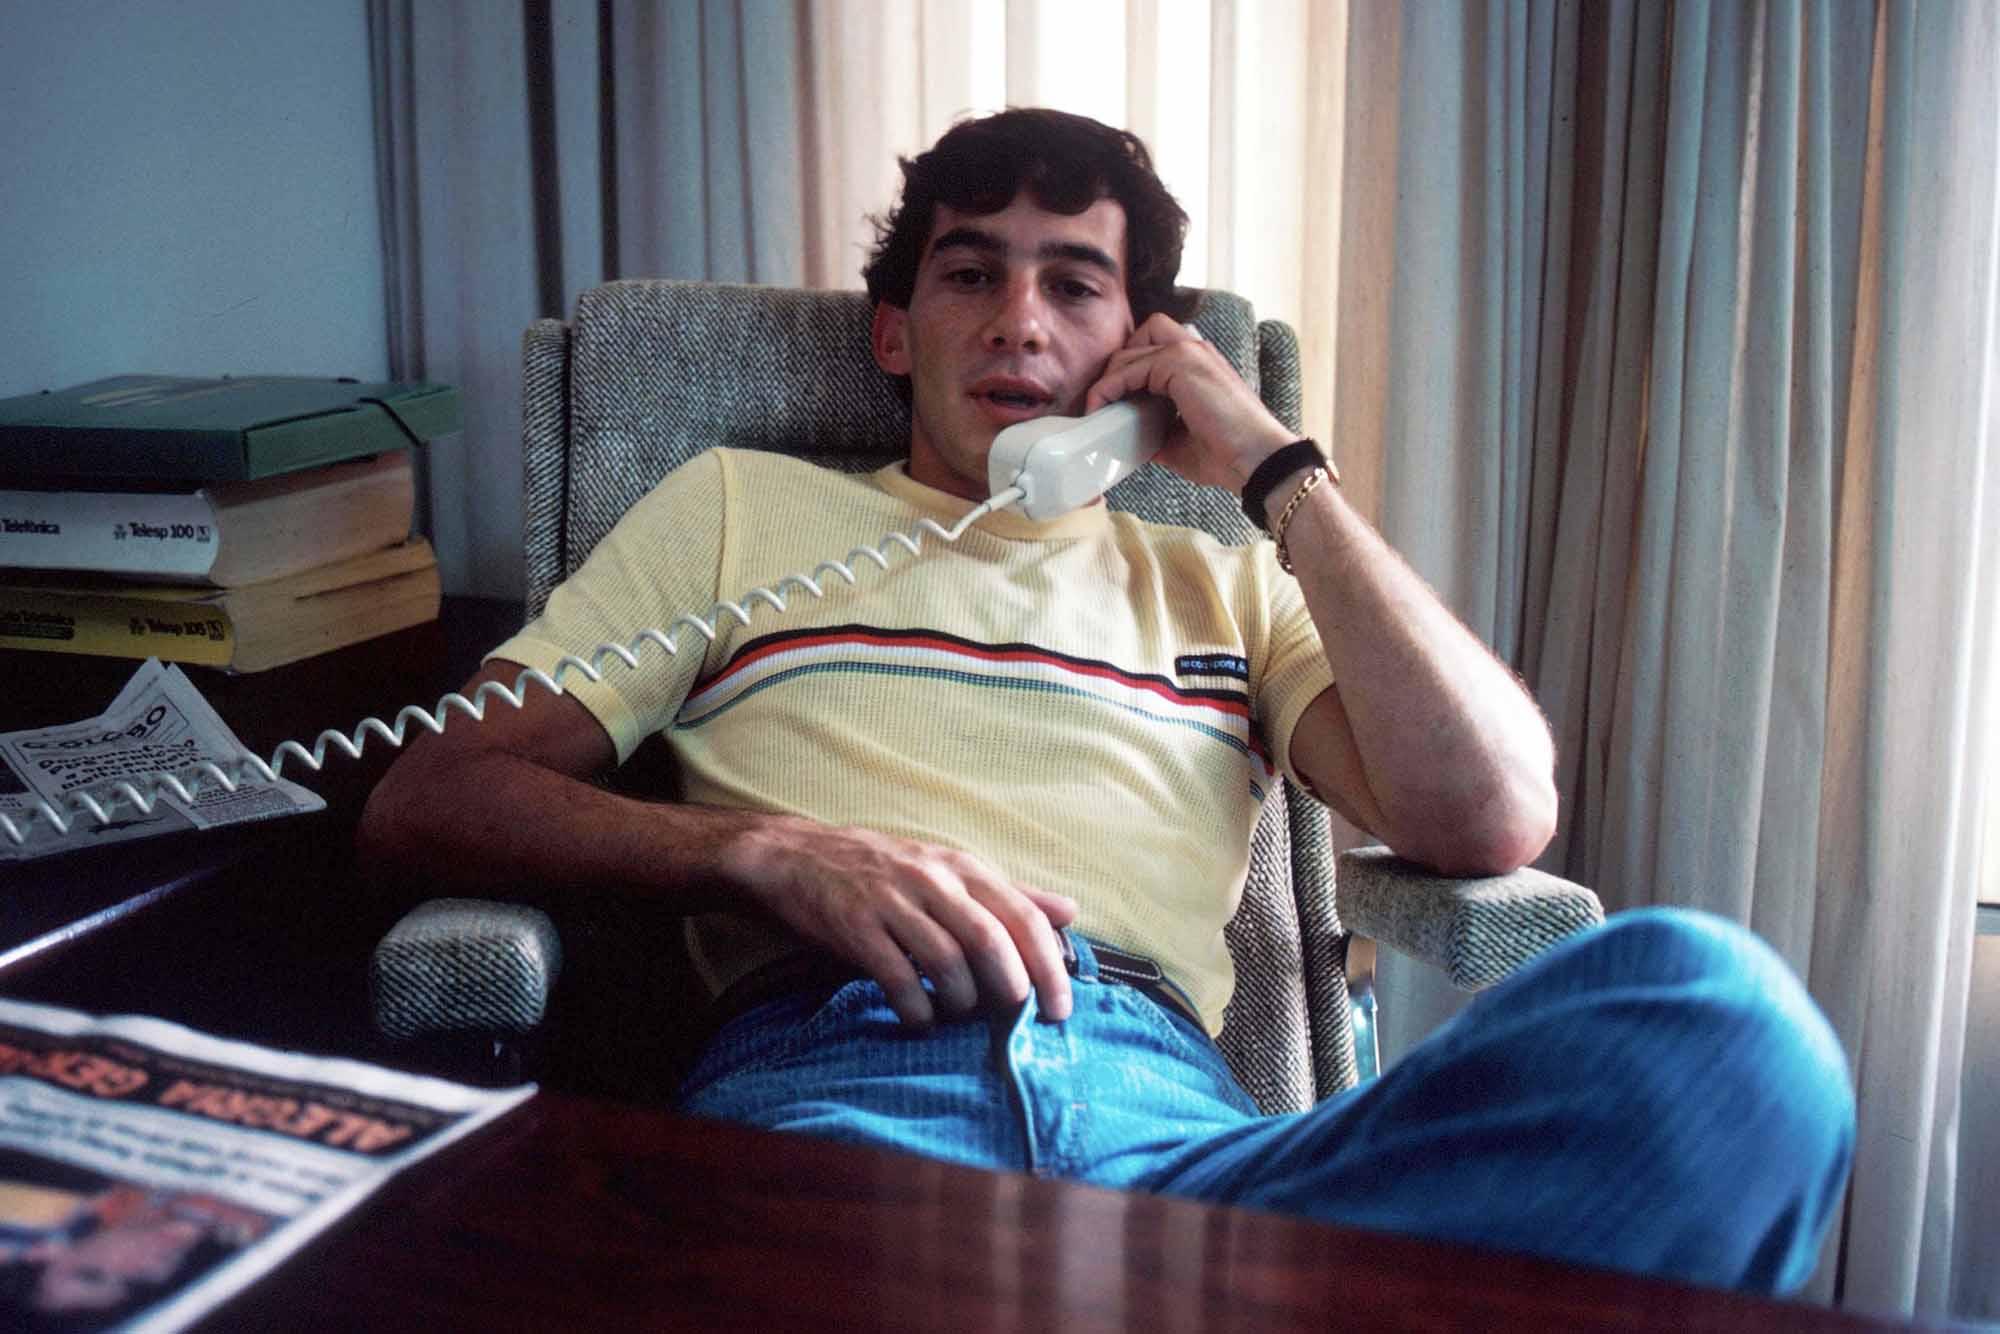 Ayrton Senna makes a business call at his family home Brazil 1984